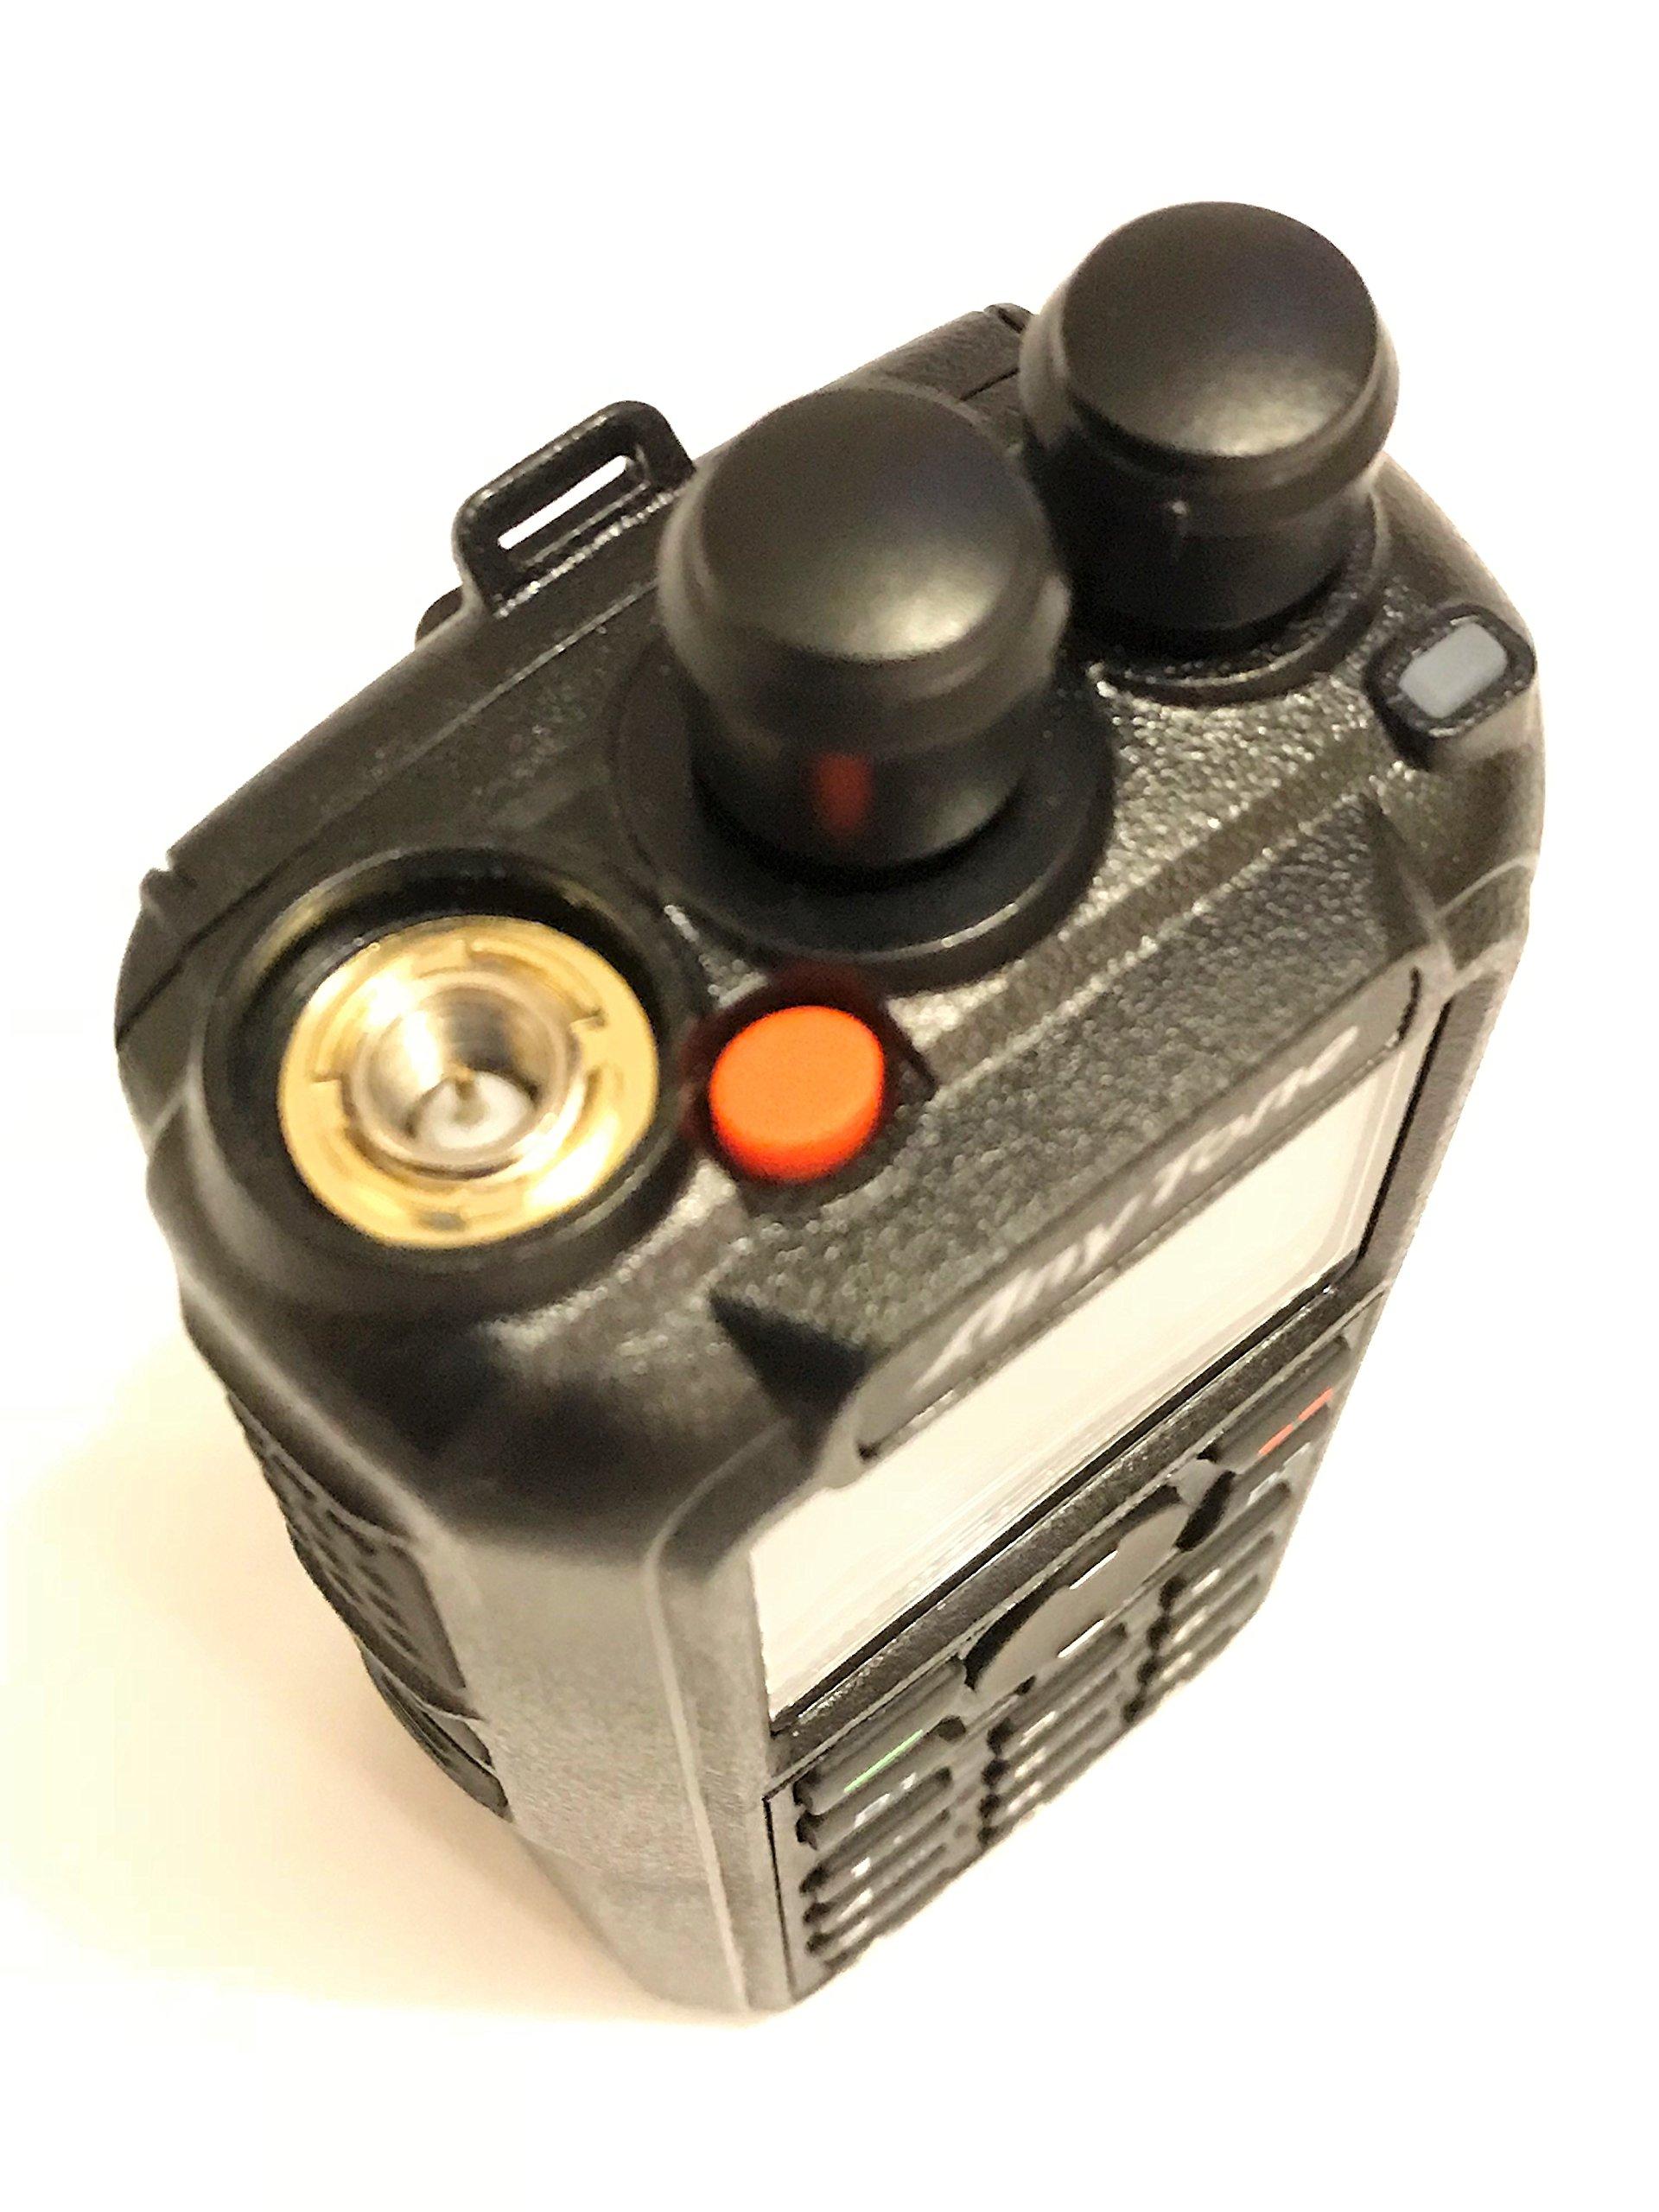 AnyTone AT-D868UV GPS Version II Upgraded 3100mAh battery Dual Band DMR/Analog 144 & 430 MHz Radio US Seller by AnyTone (Image #8)